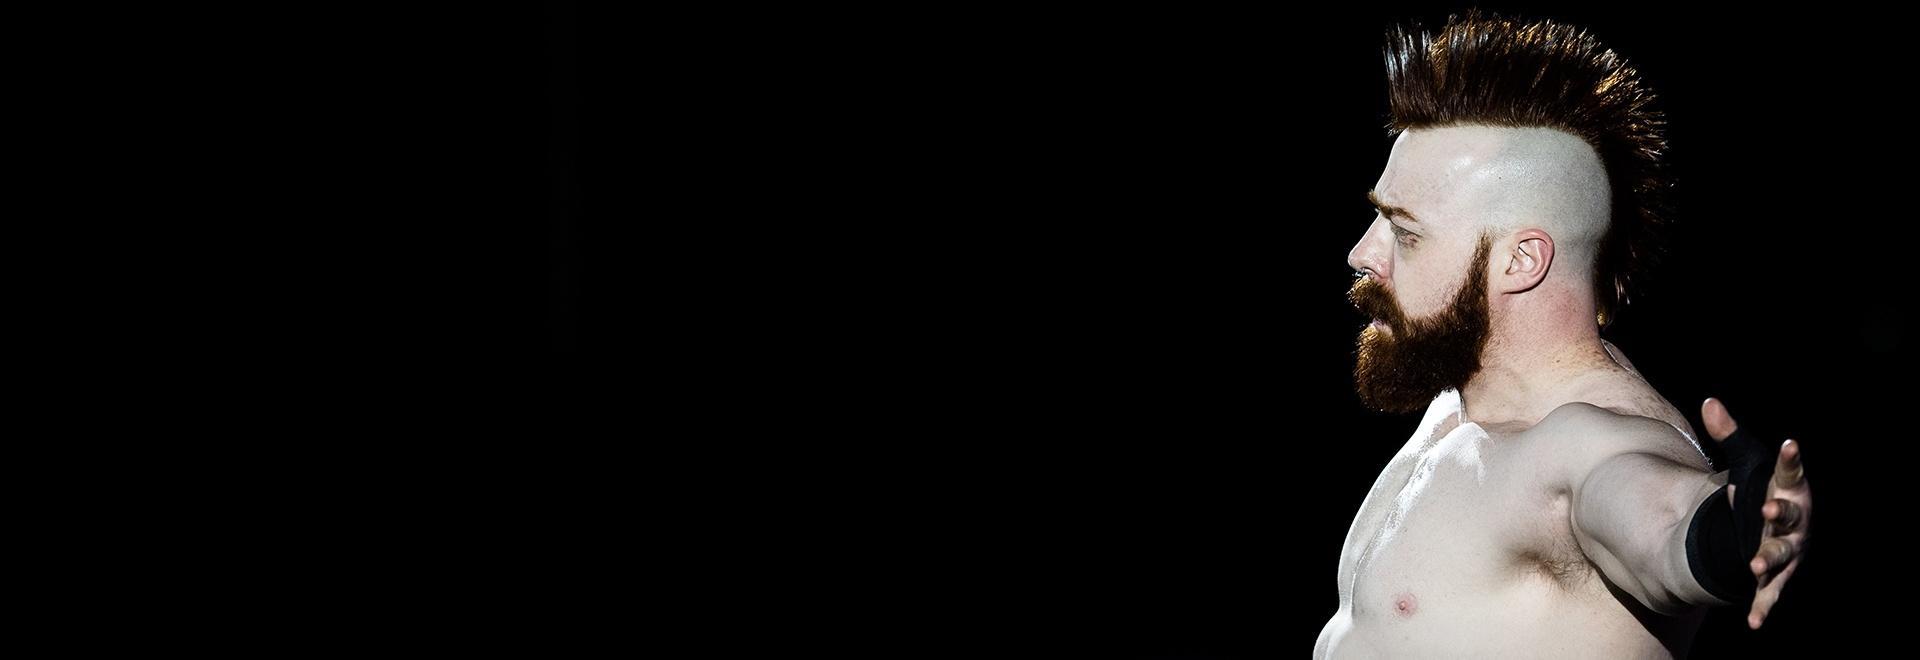 Ep. 53